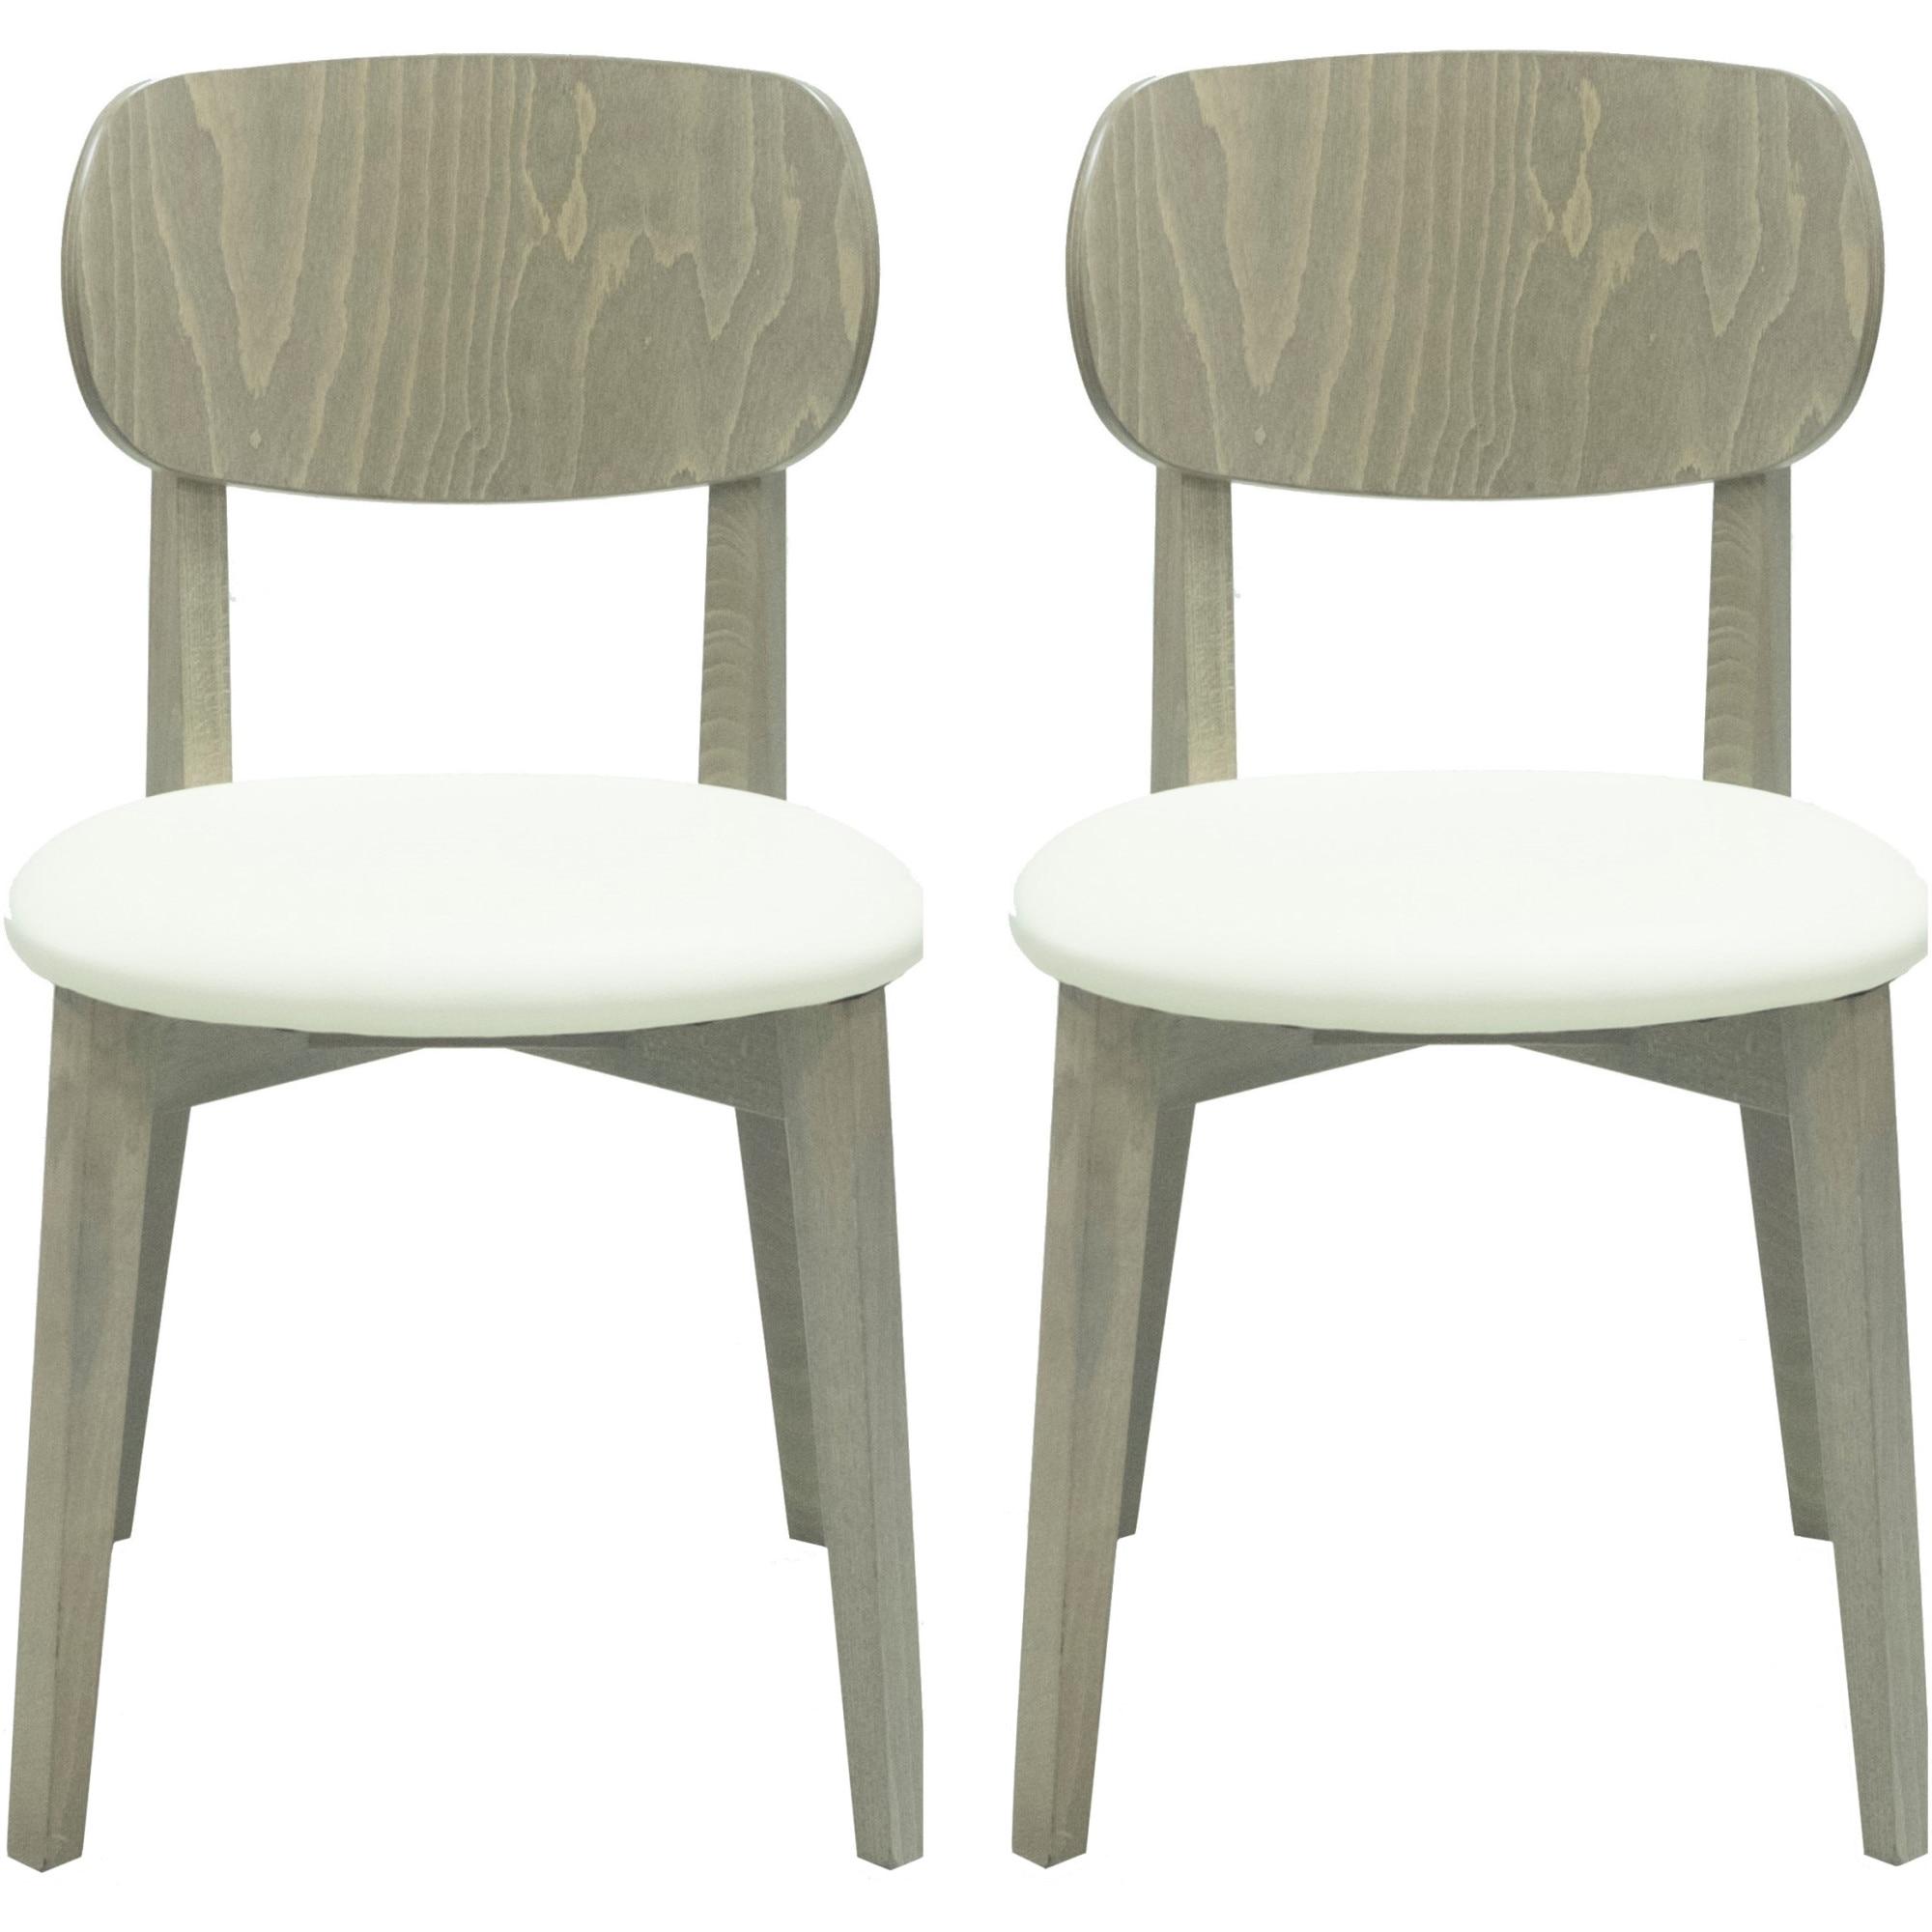 Fotografie Set 2 scaune Kasto Dimmy, lemn esenta tare, culoare Stejar RiverSide